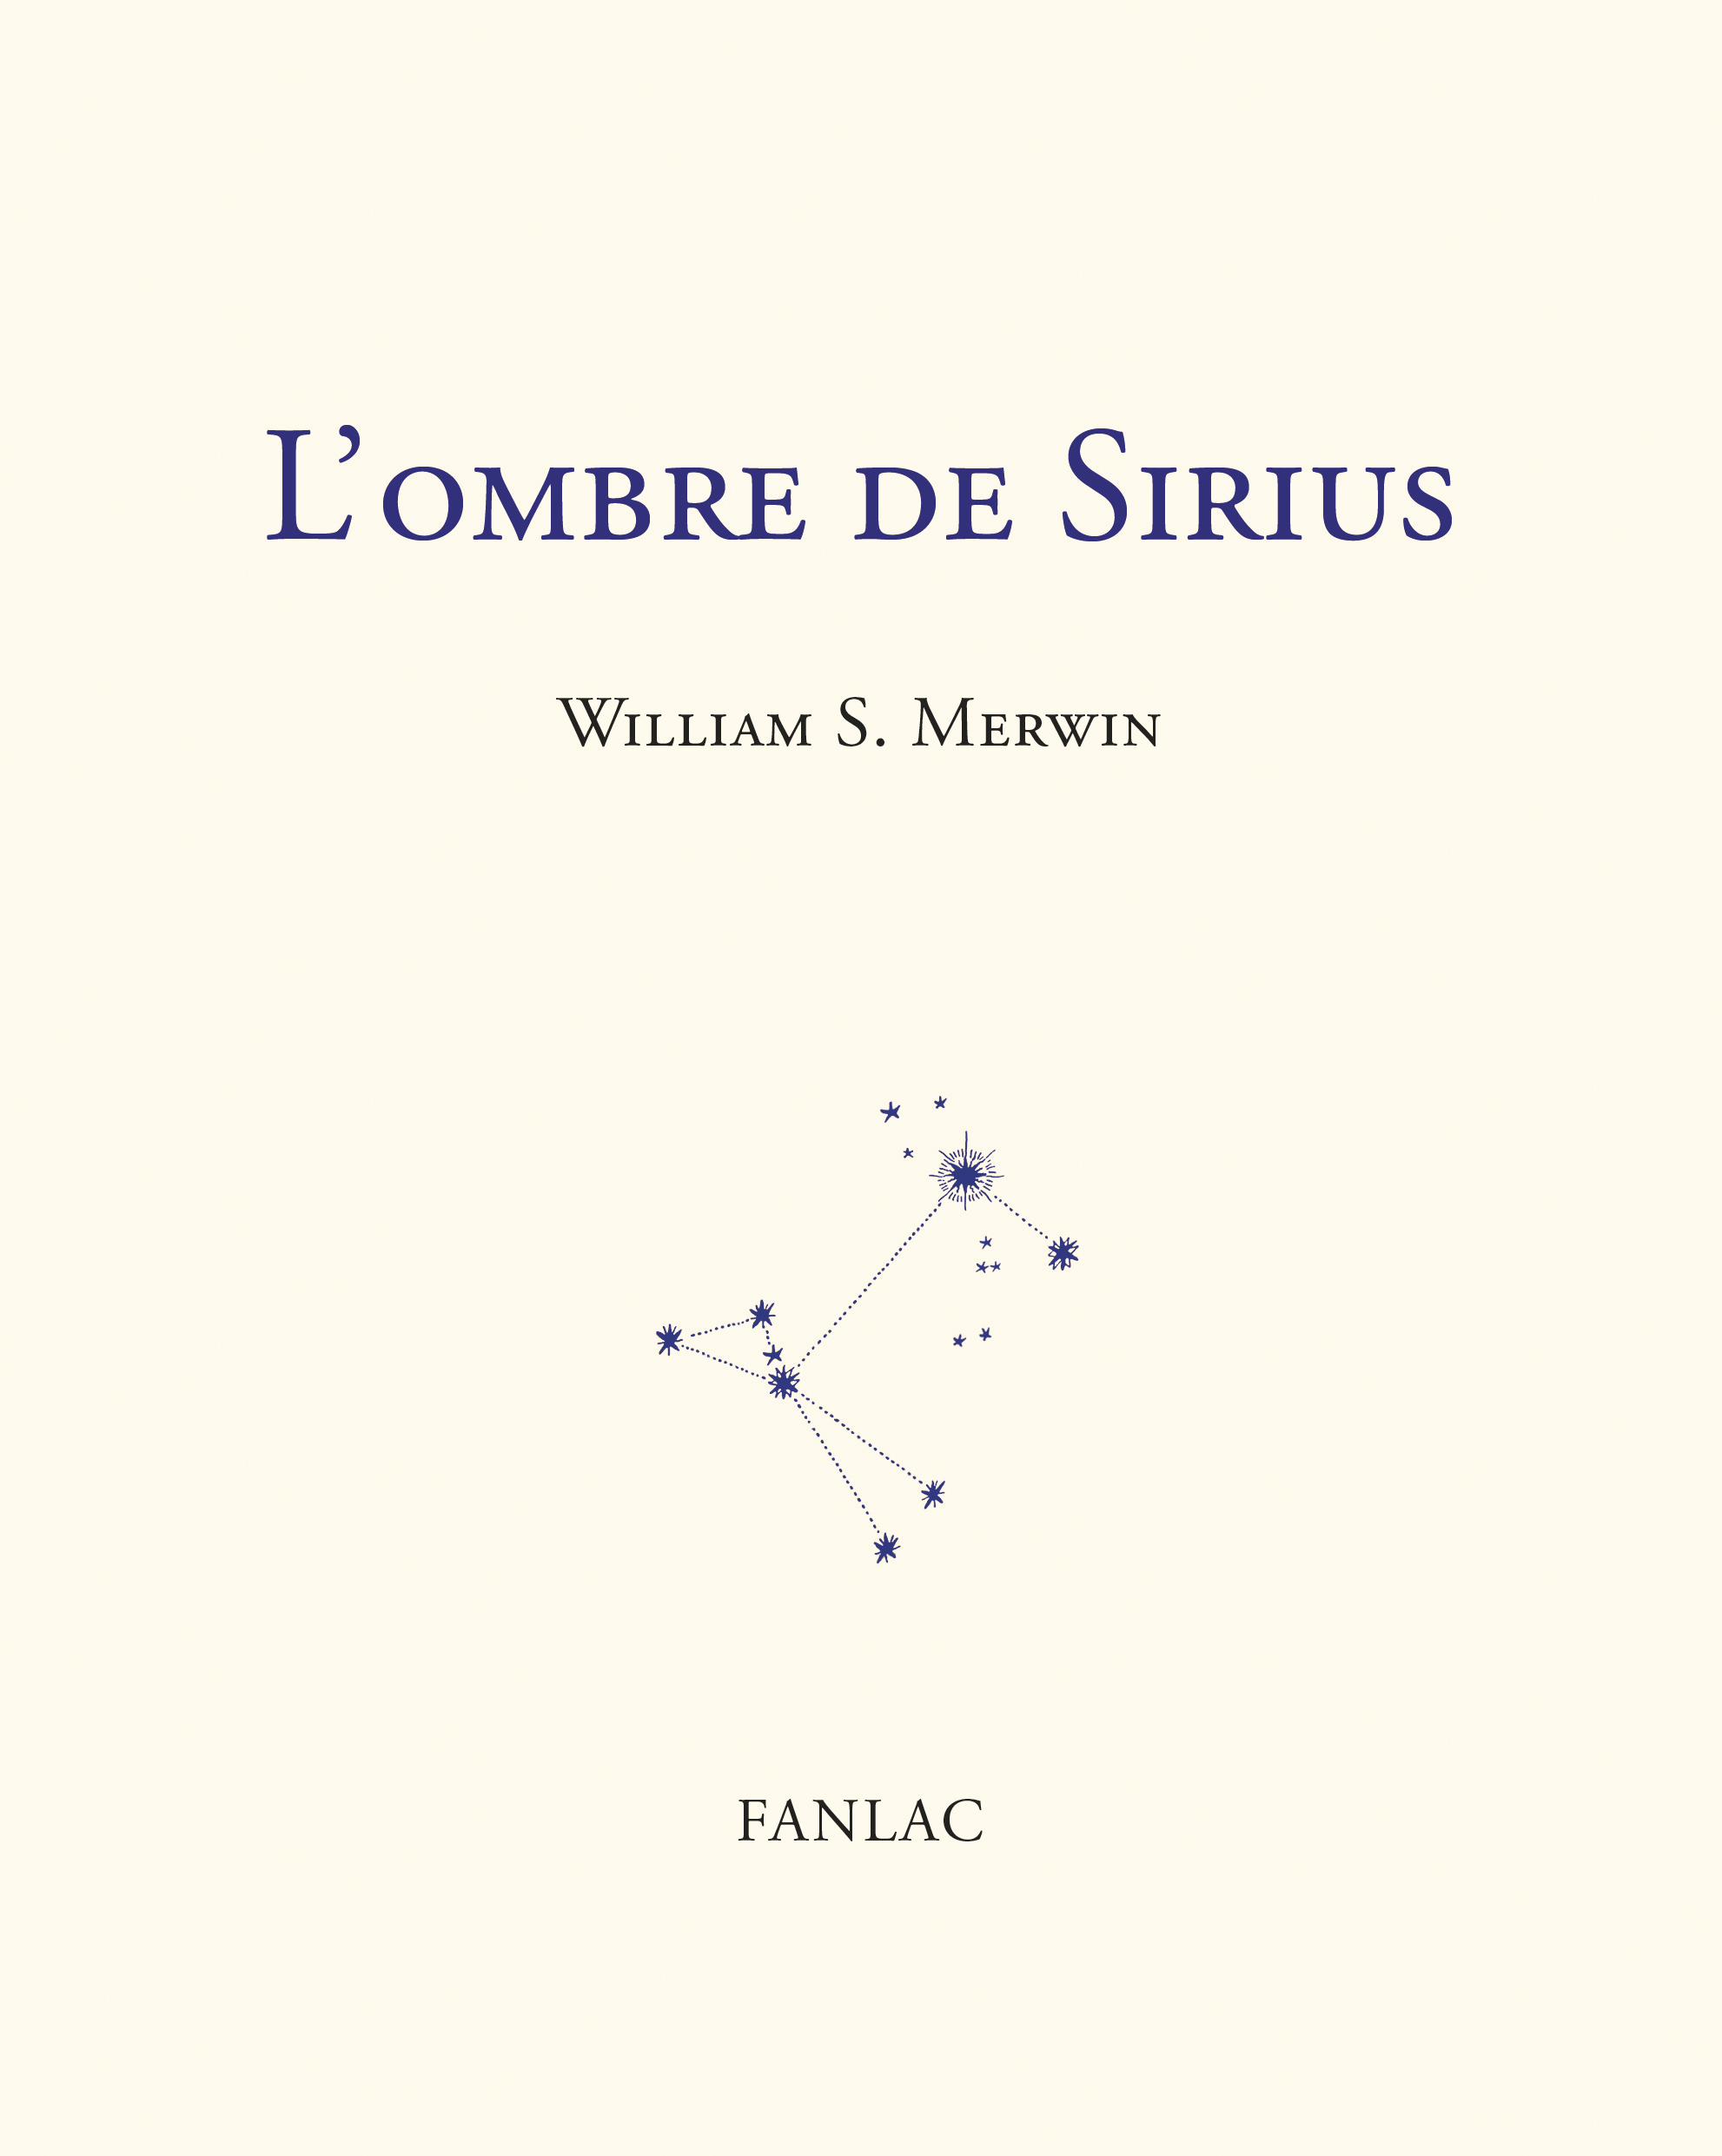 L'OMBRE DE SIRIUS